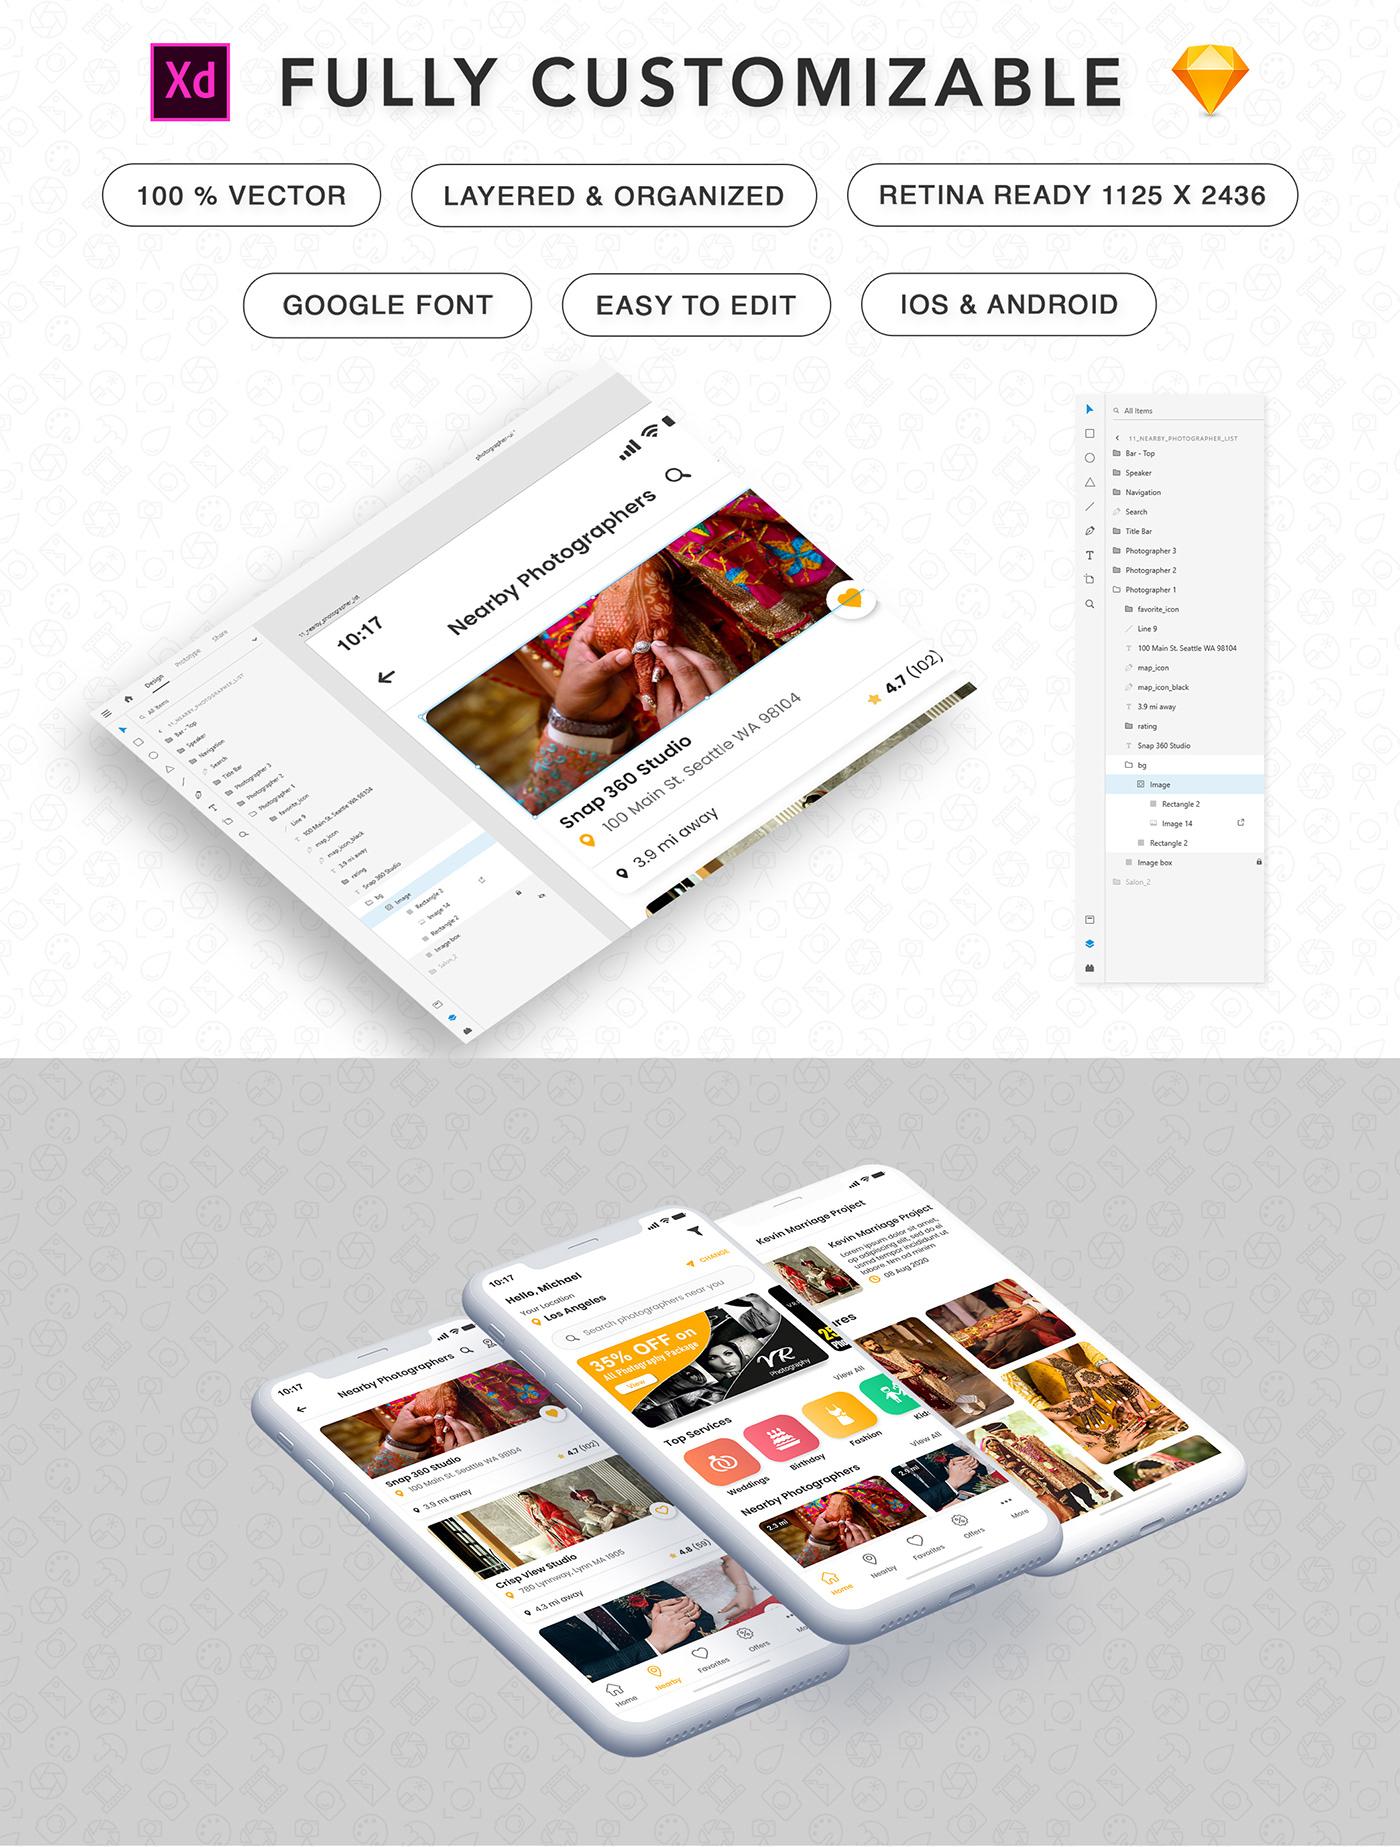 android Android App Find Photographer app iOS app design photographer Photographer app design Photography  photoshoot photostudio ui kit